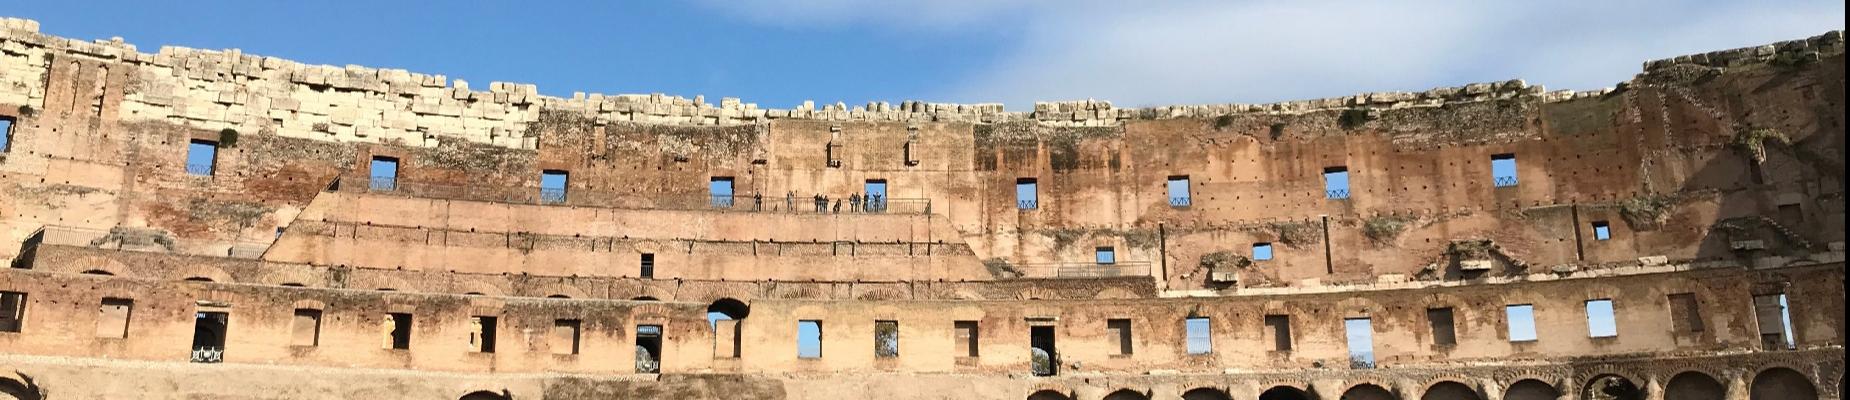 roman colosseum-2-final